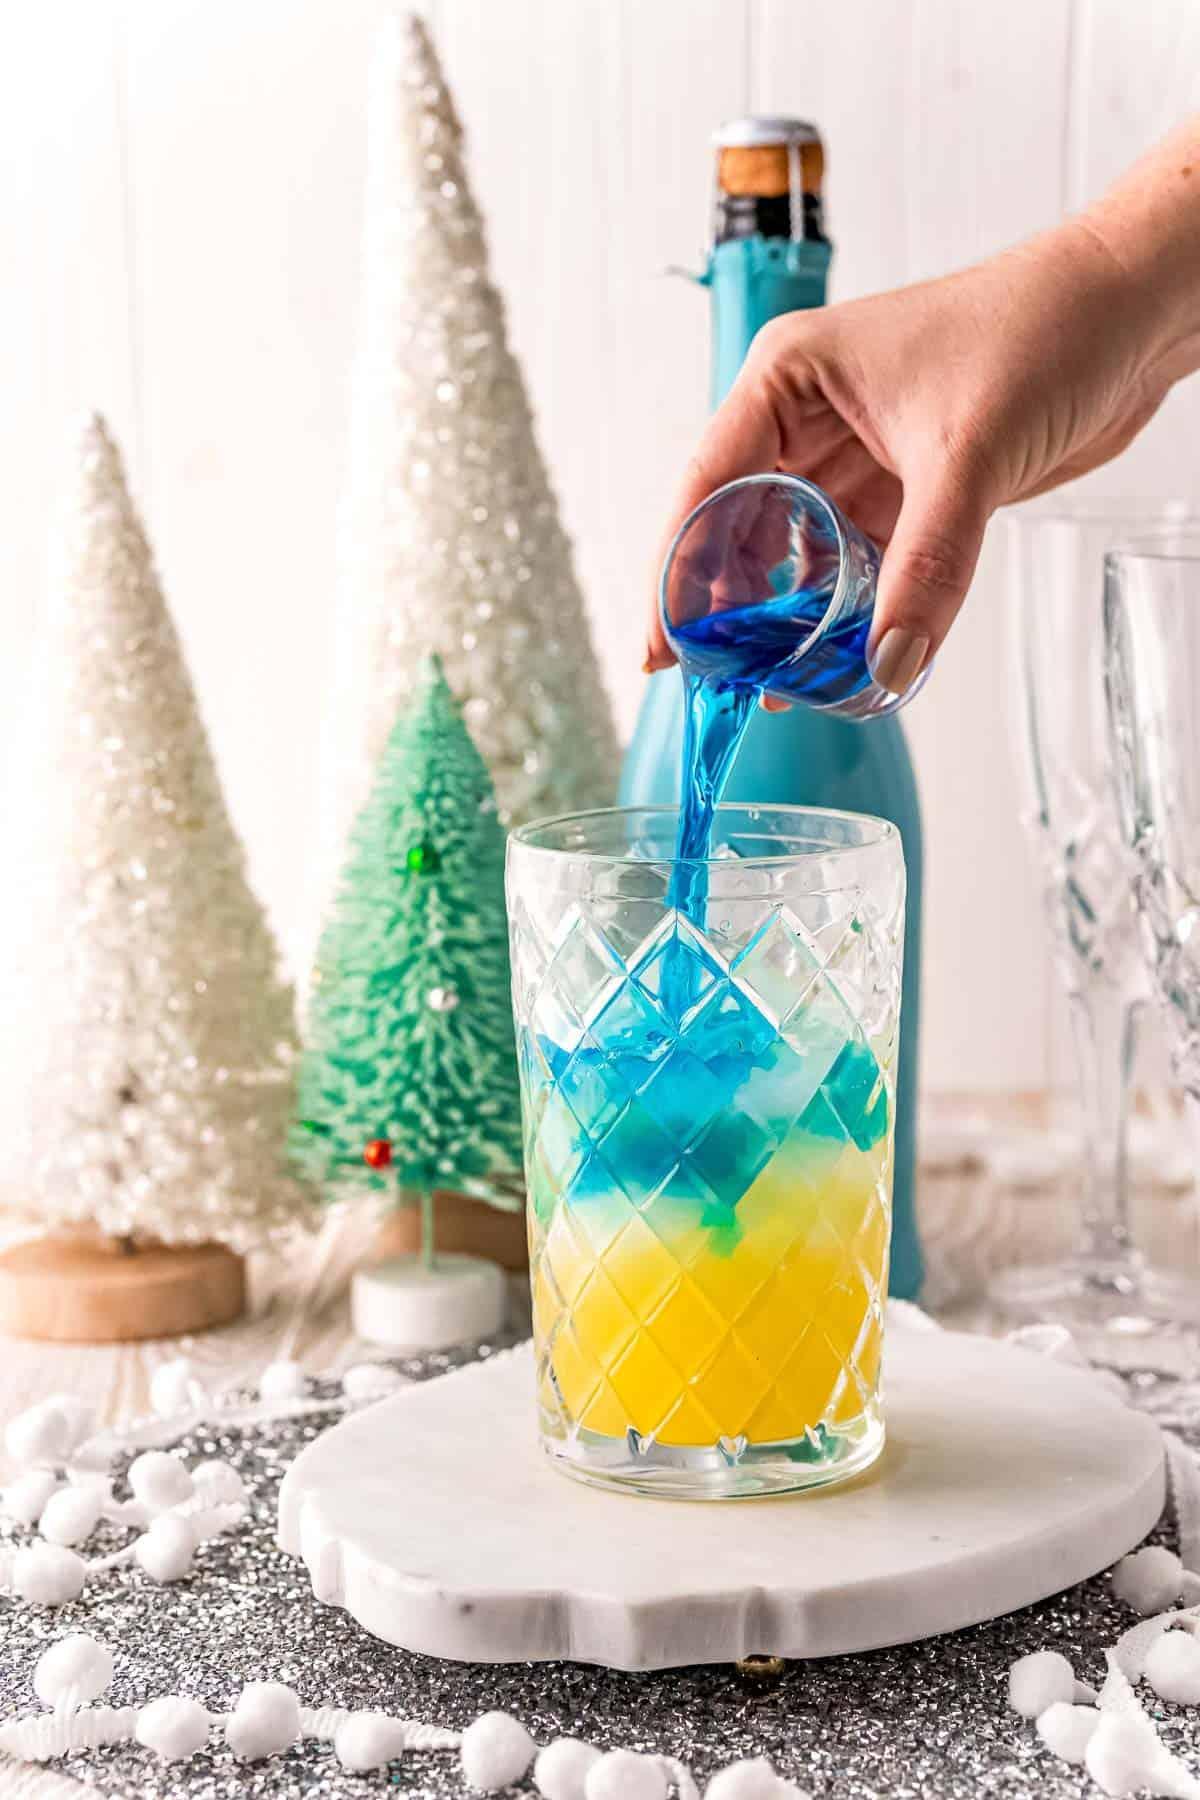 Blue liquid being poured into orange juice.